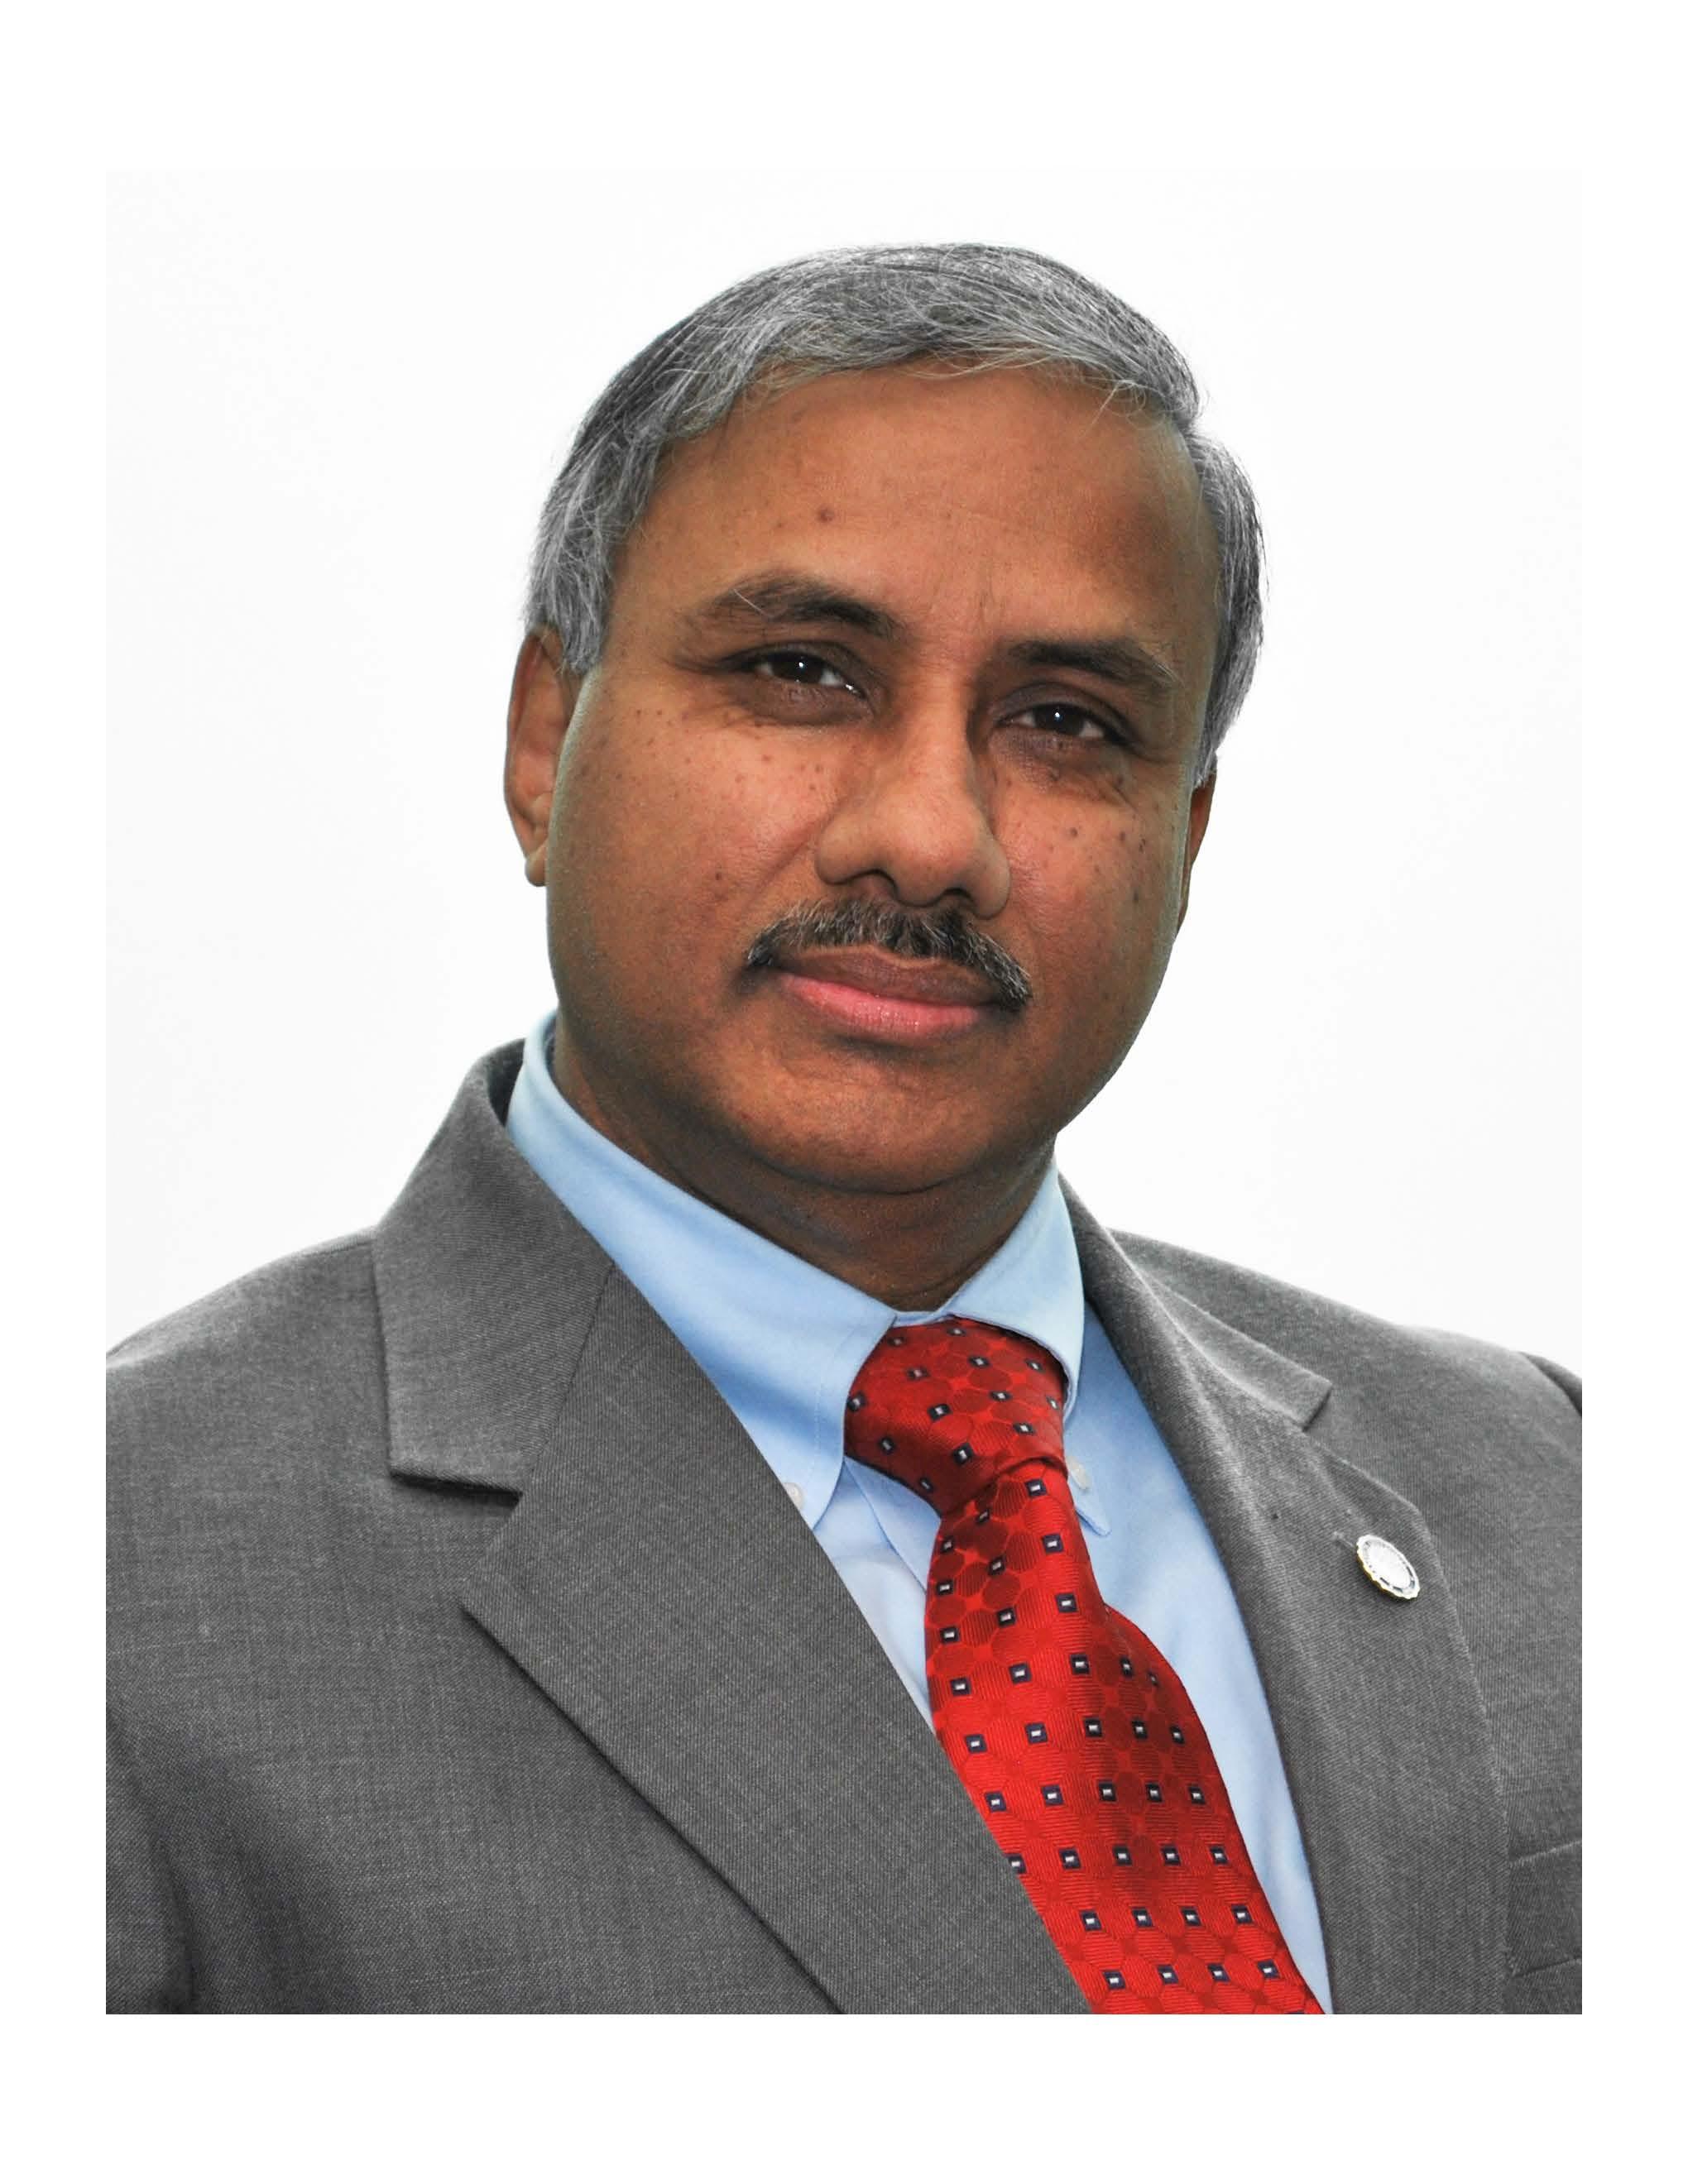 Arun K Verma  Endowed University Professor and Chair  Hampton University  arun.verma@hamptonu.edu